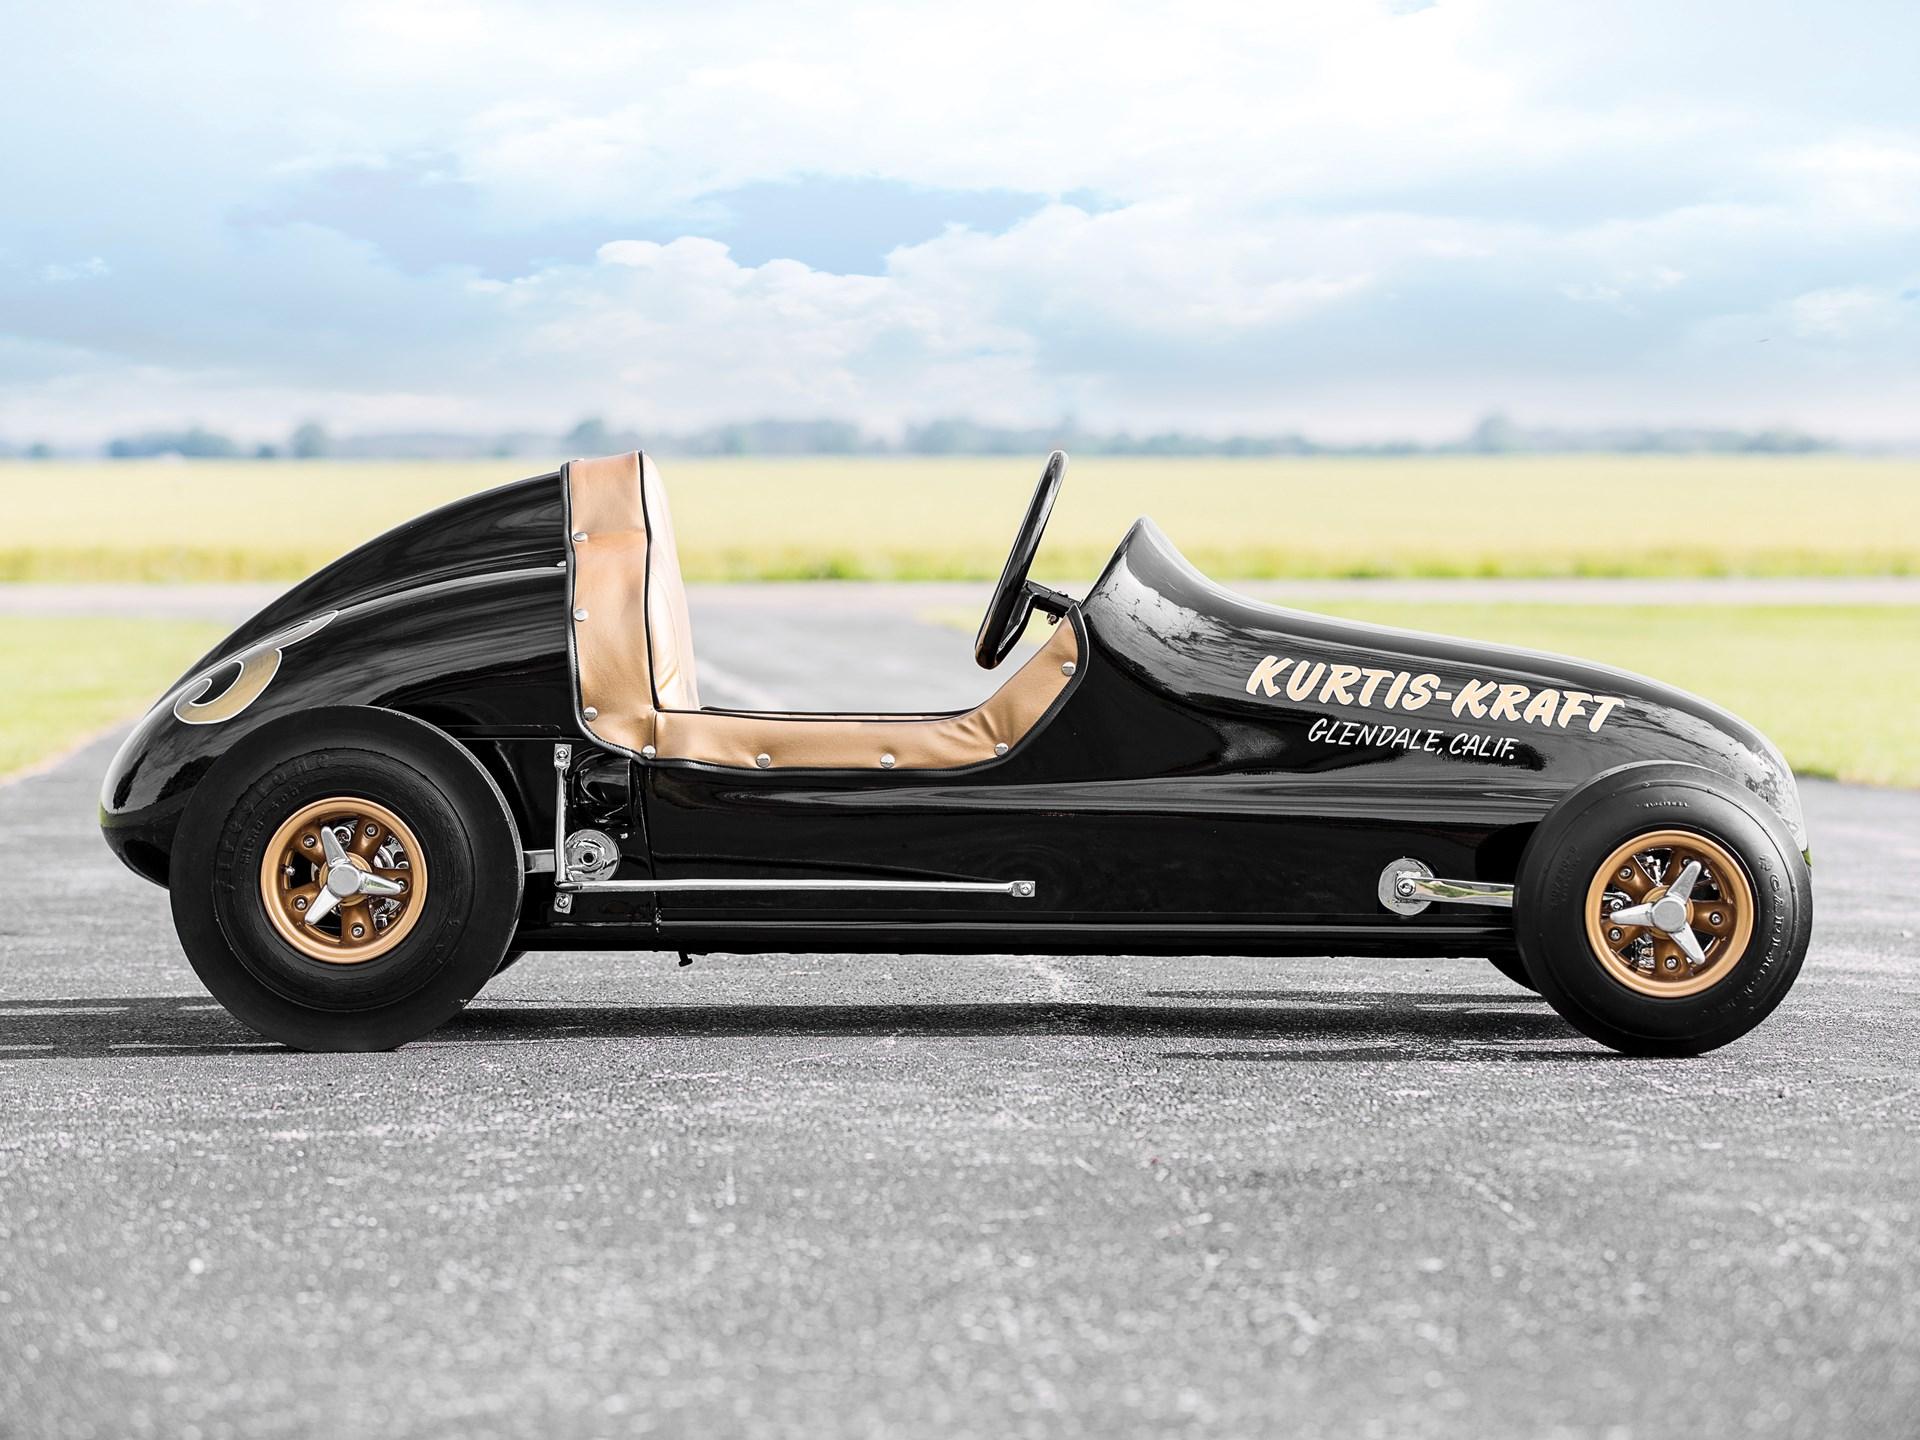 Kurtis craft midget race car are absolutely